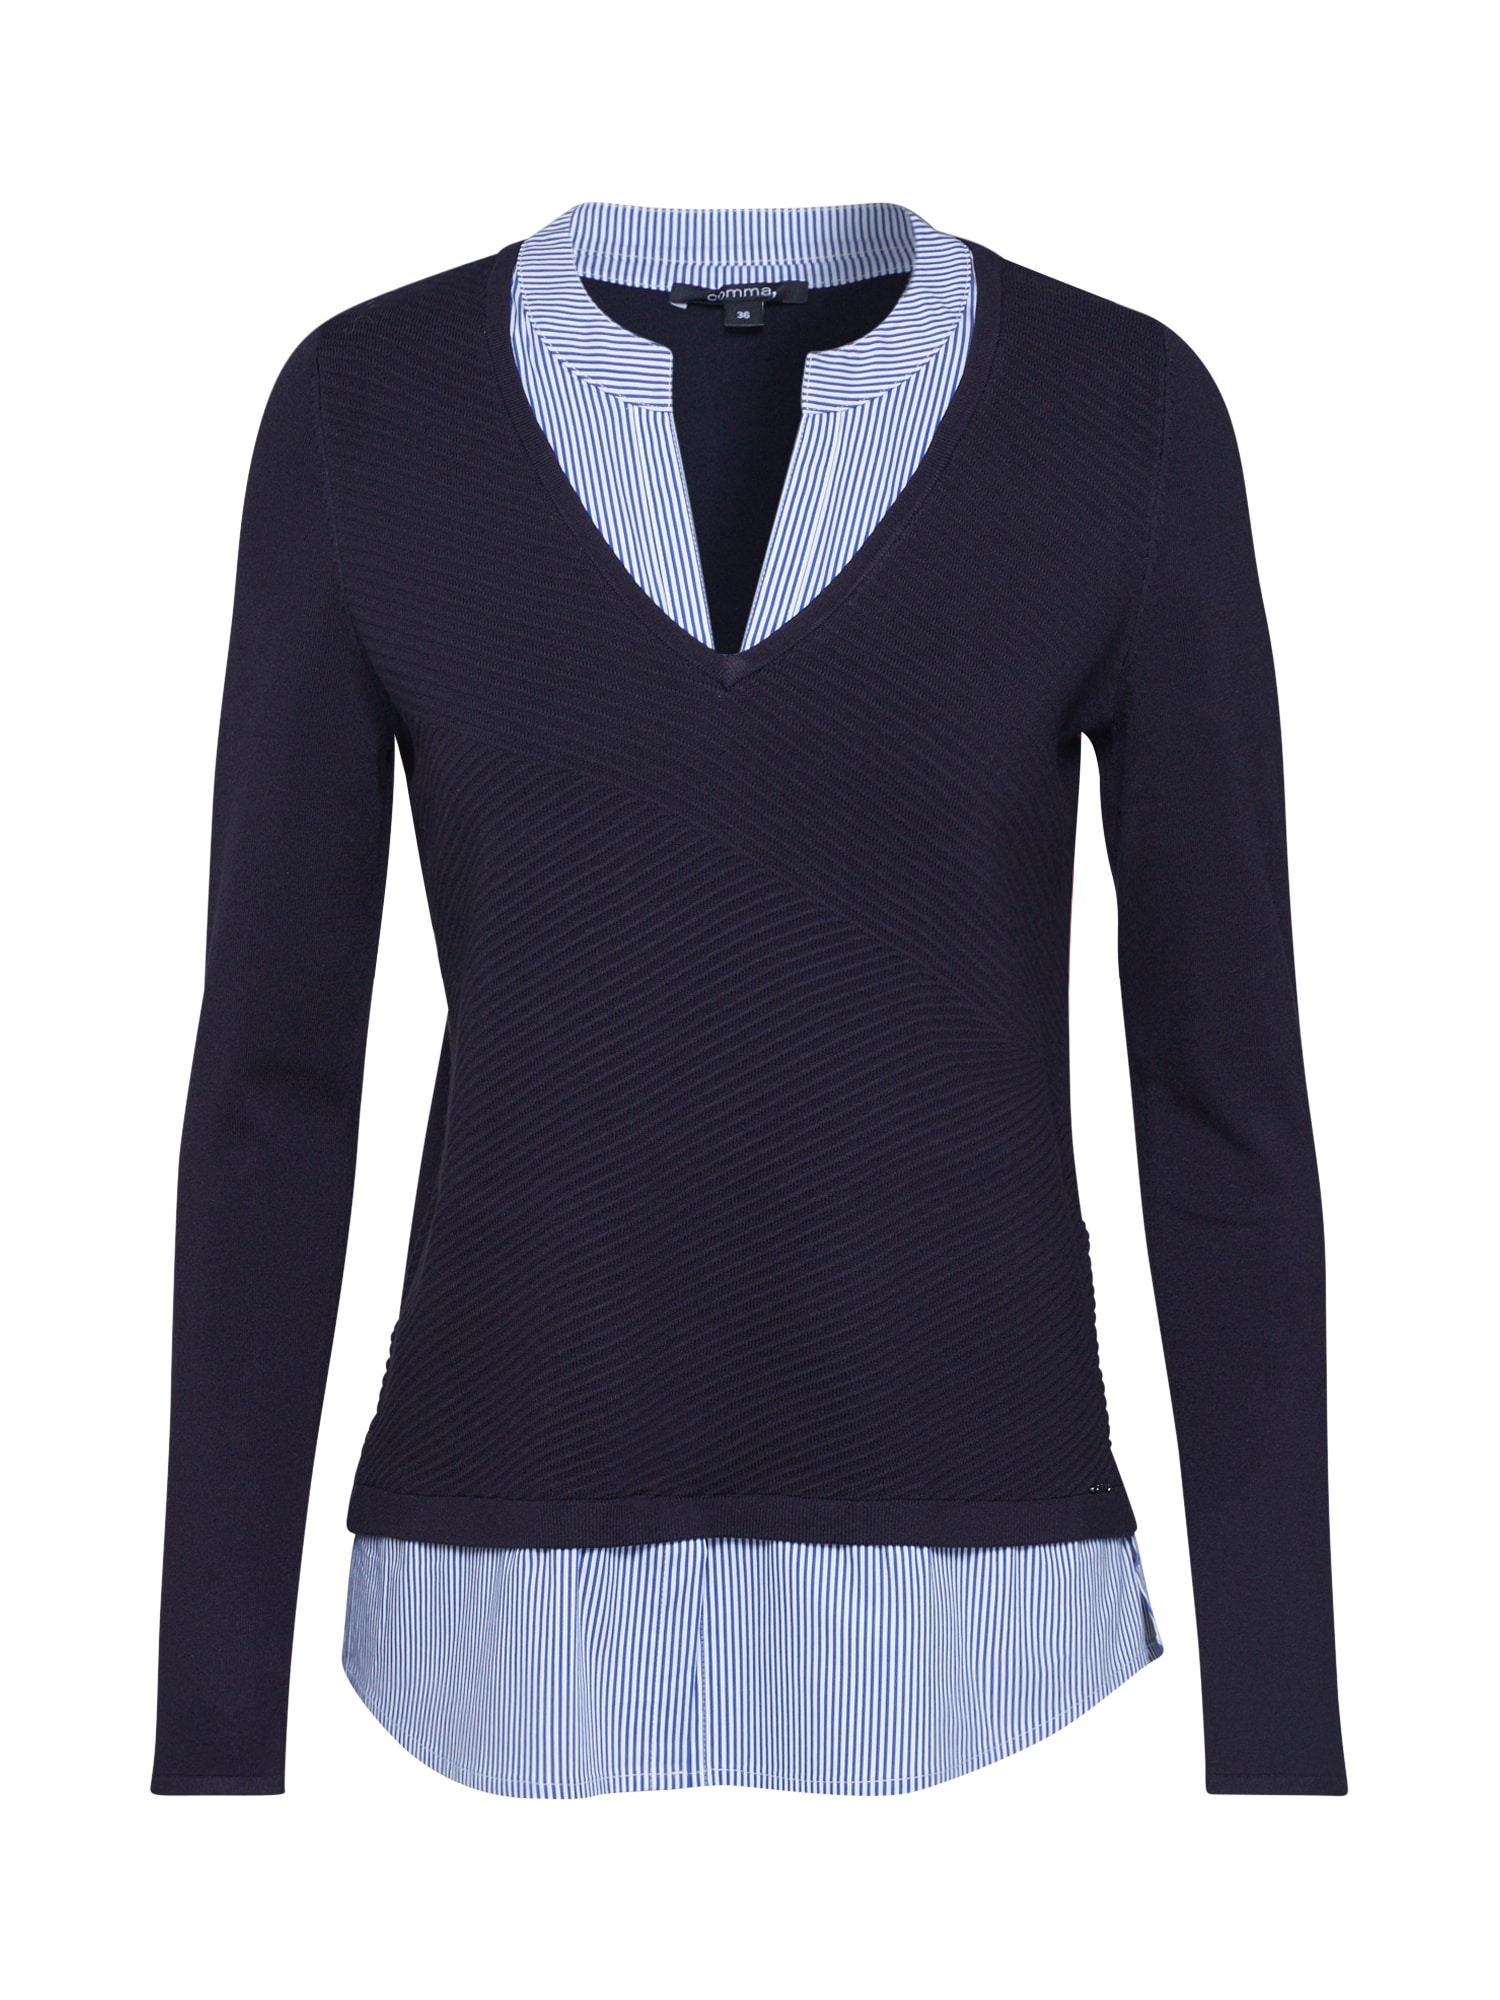 COMMA Megztinis tamsiai mėlyna / balta